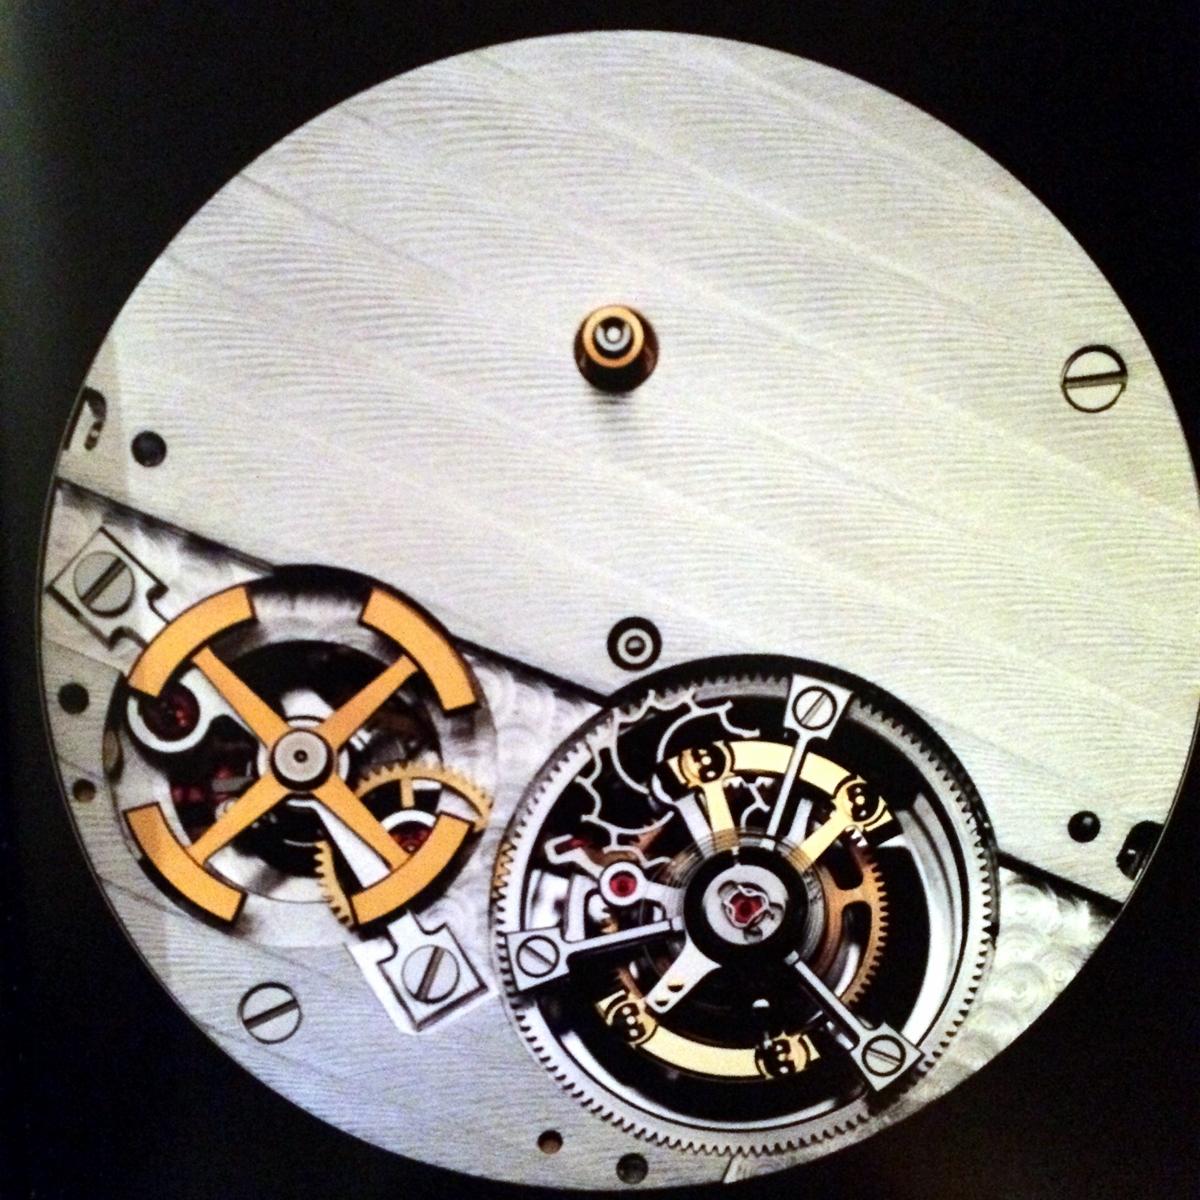 11 design z zegarkiem w ręku luksusowe zegarki SIHH Geneve lifestyle forelements blog